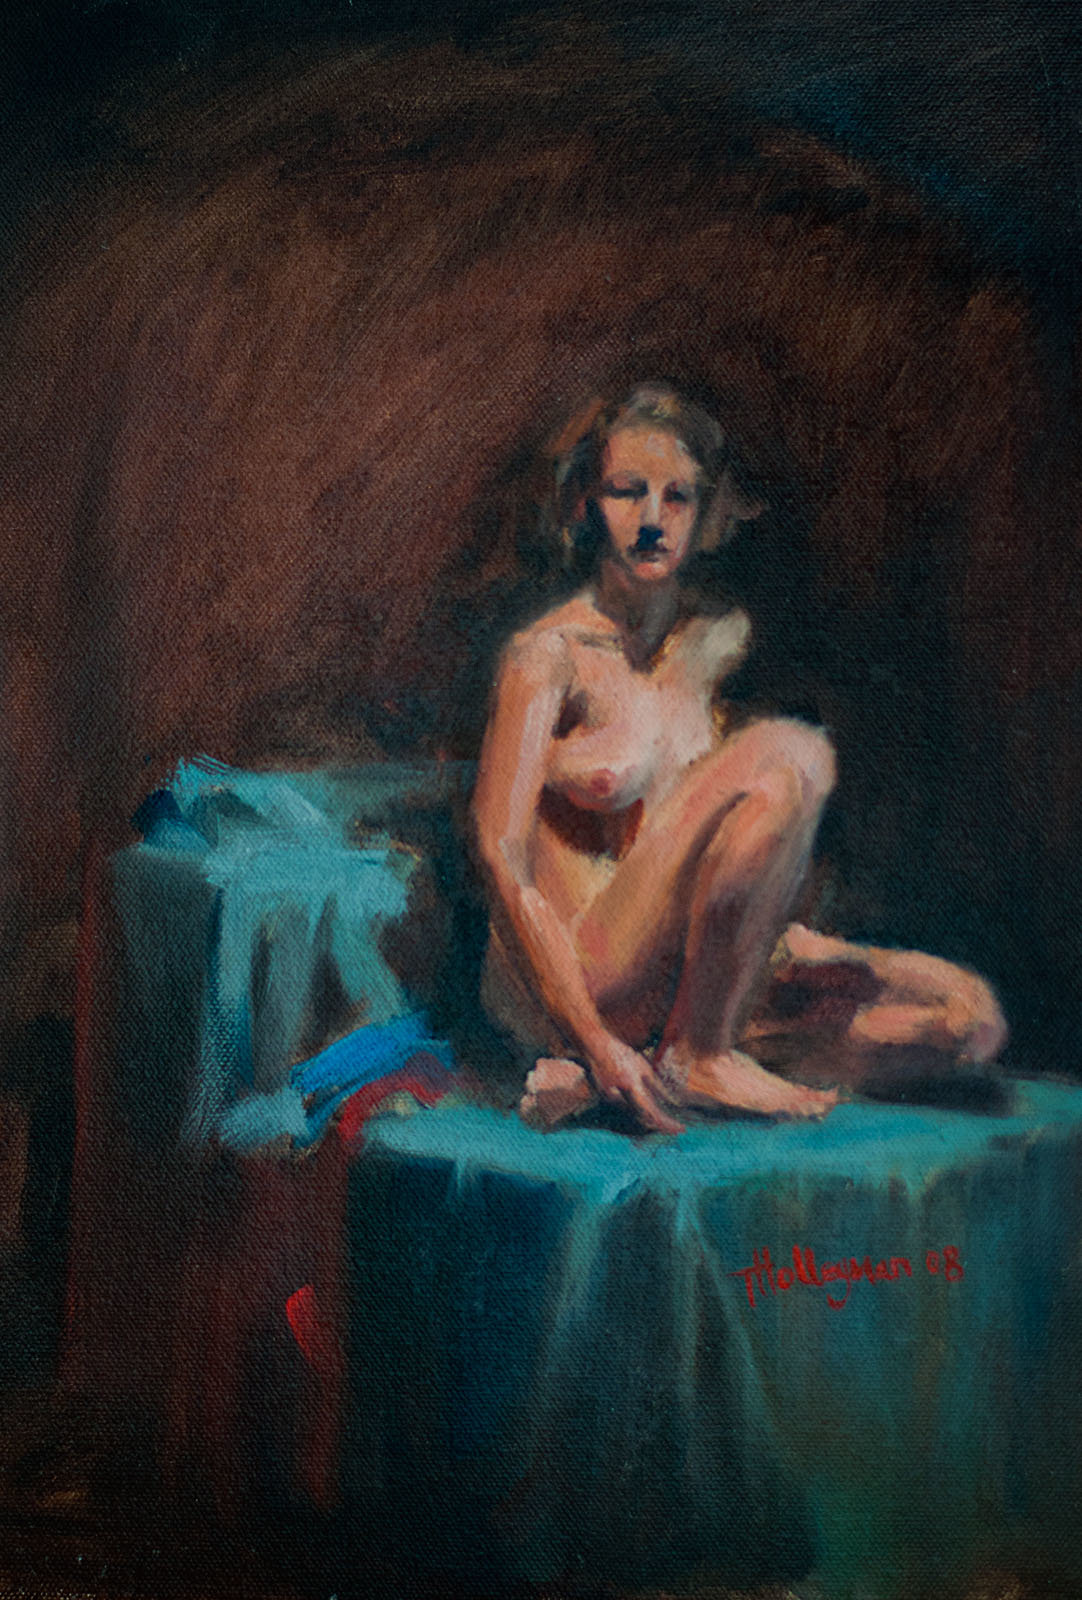 Tim holleyman nude 02